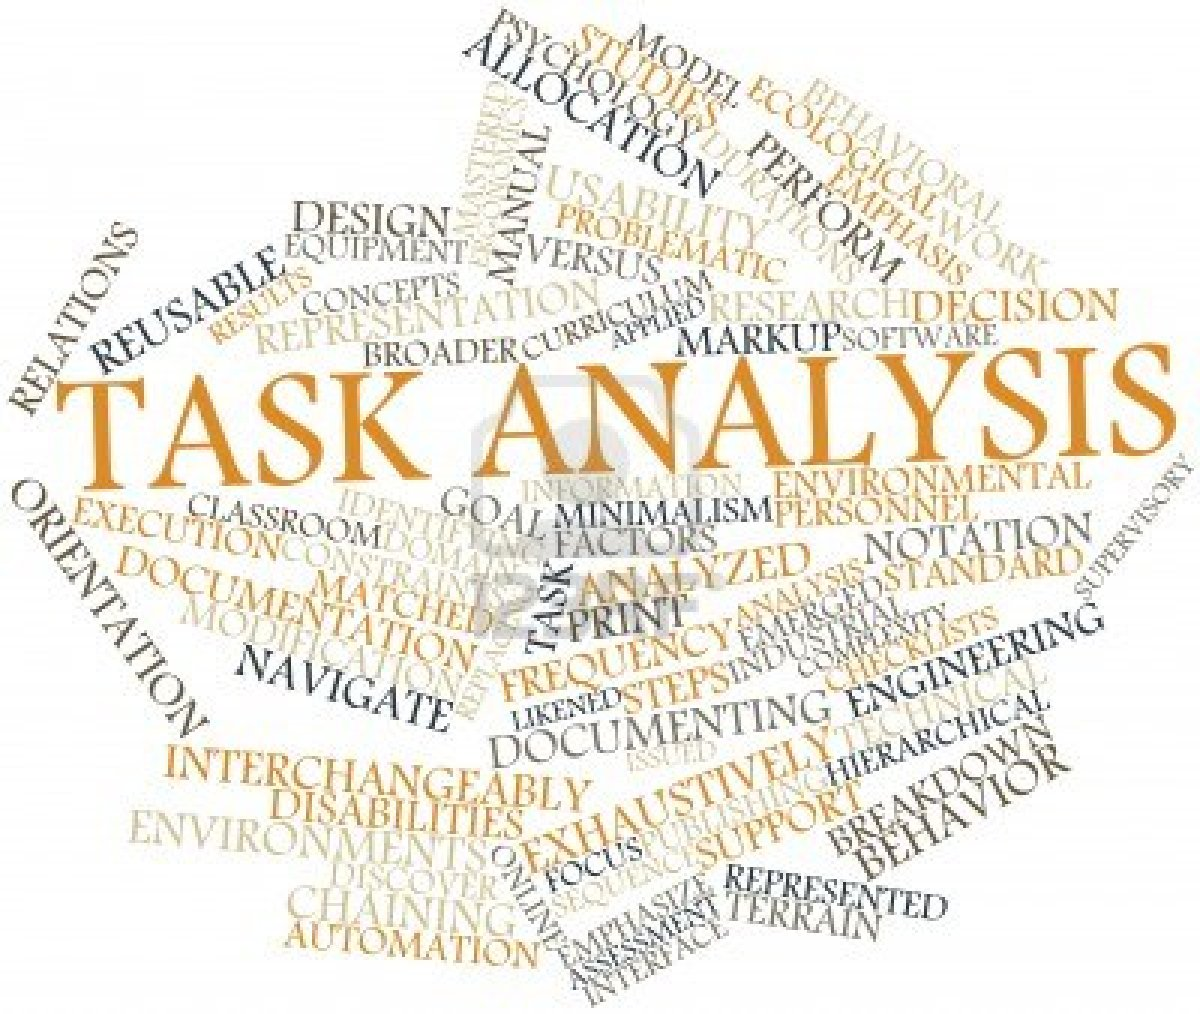 Task Analysis word cloud